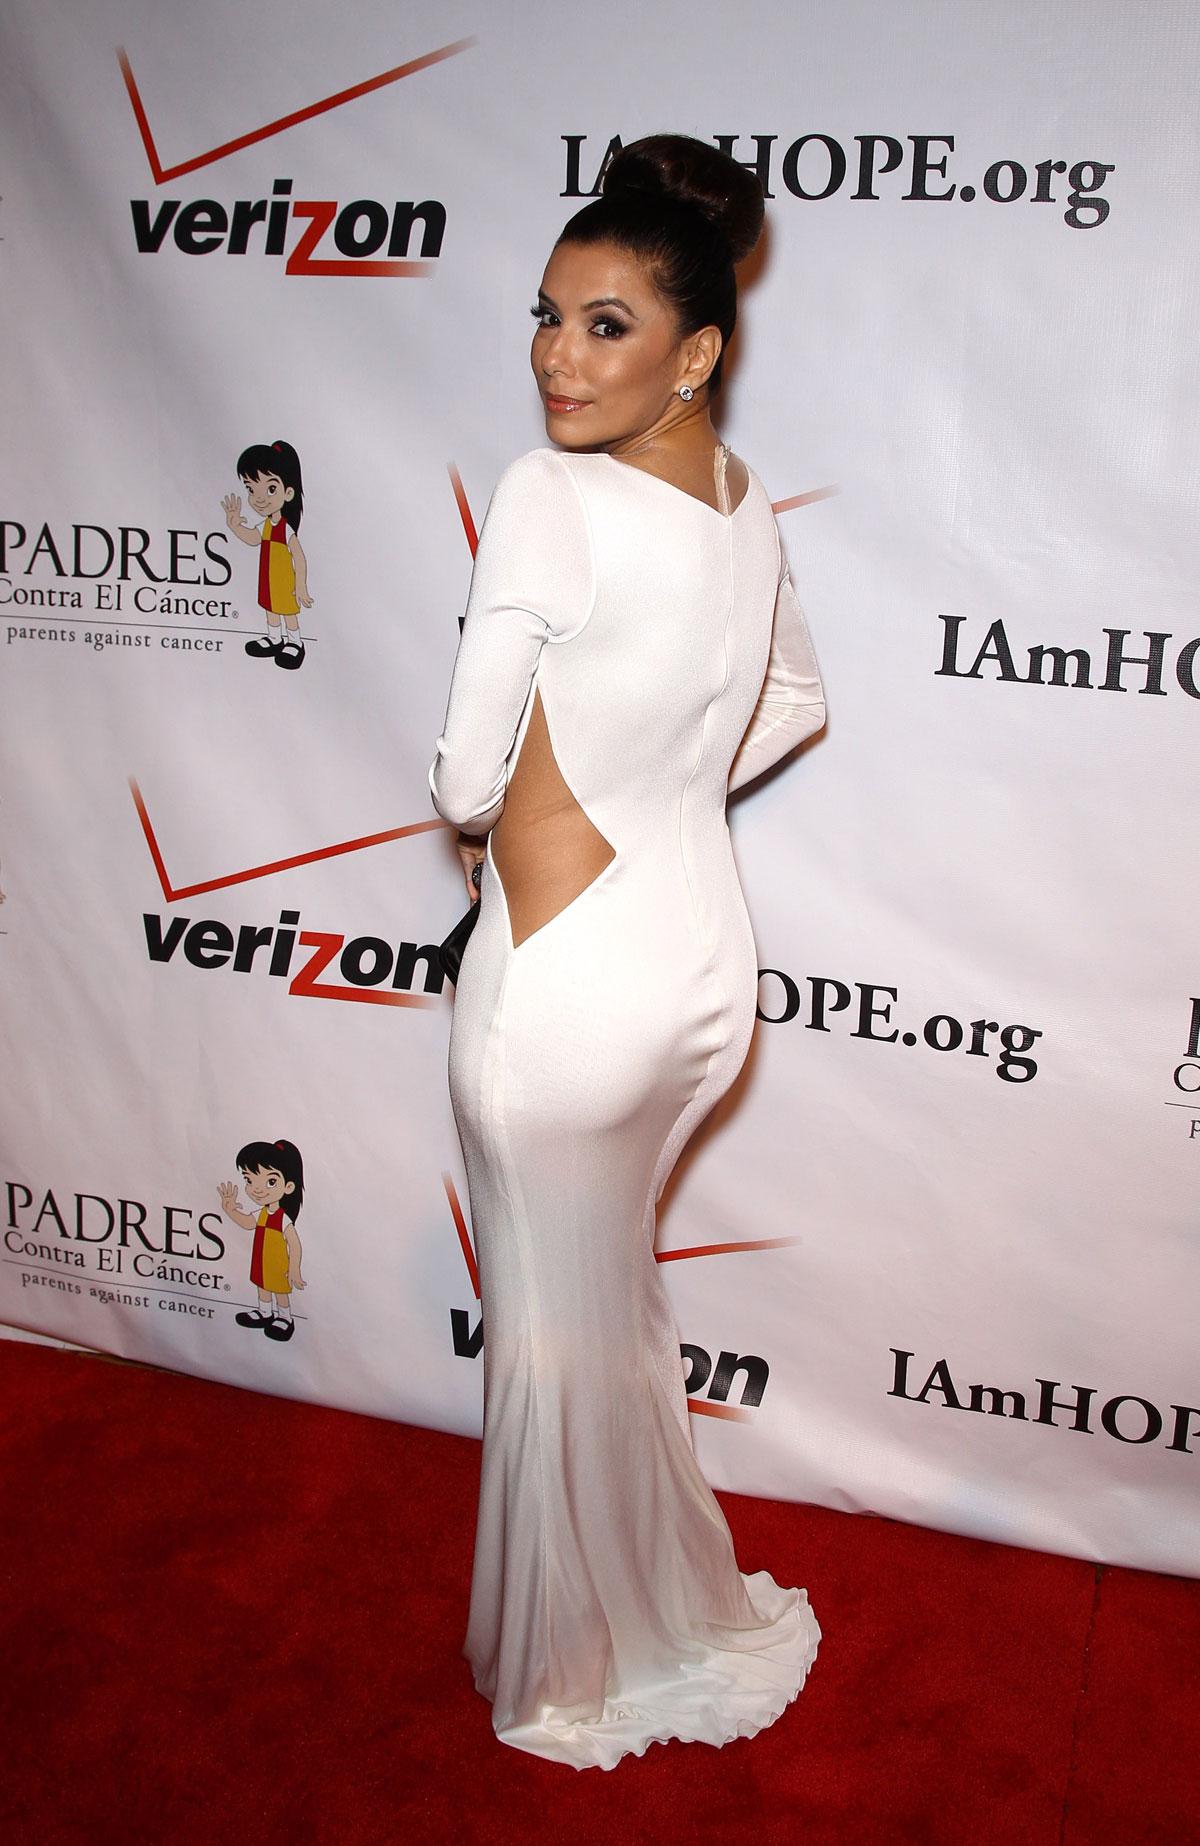 Eva Longoria - Hot In Tight White Dress at 2012 Padres Contra El Cancer Gala-03 | GotCeleb